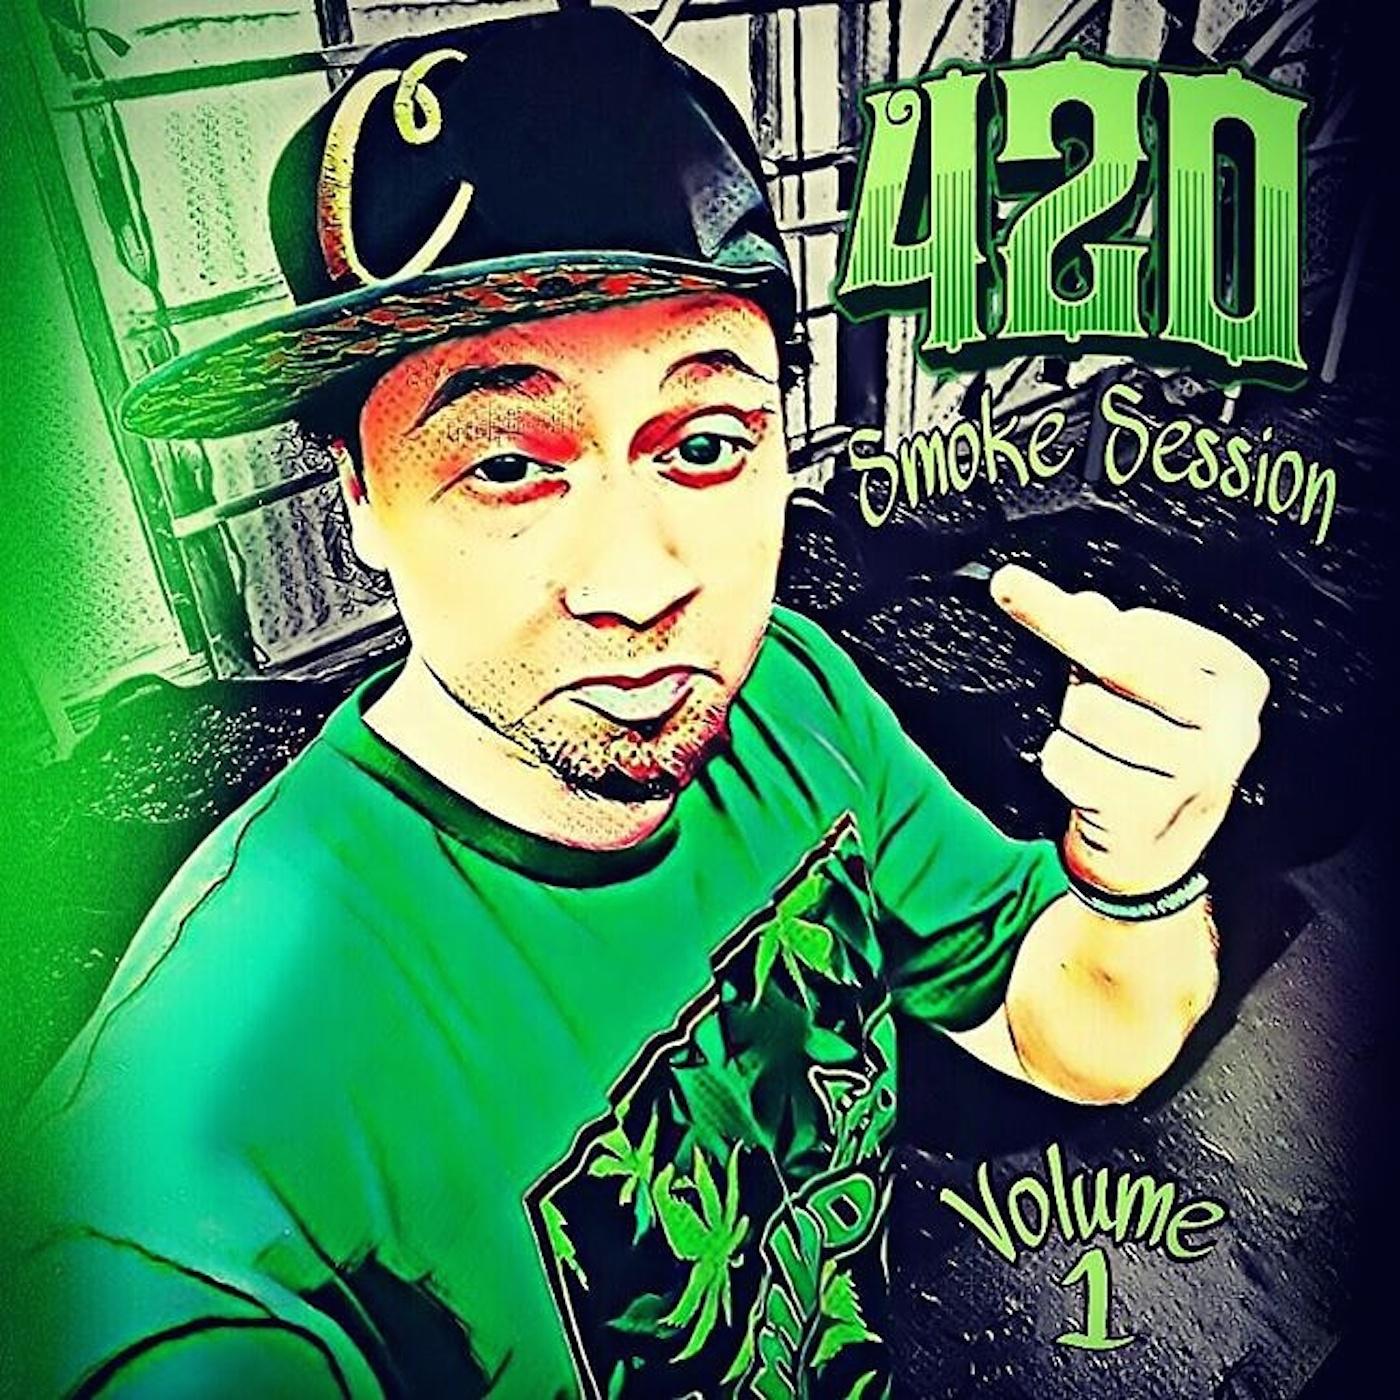 Smoke Session Vol. 1 COVER.jpg